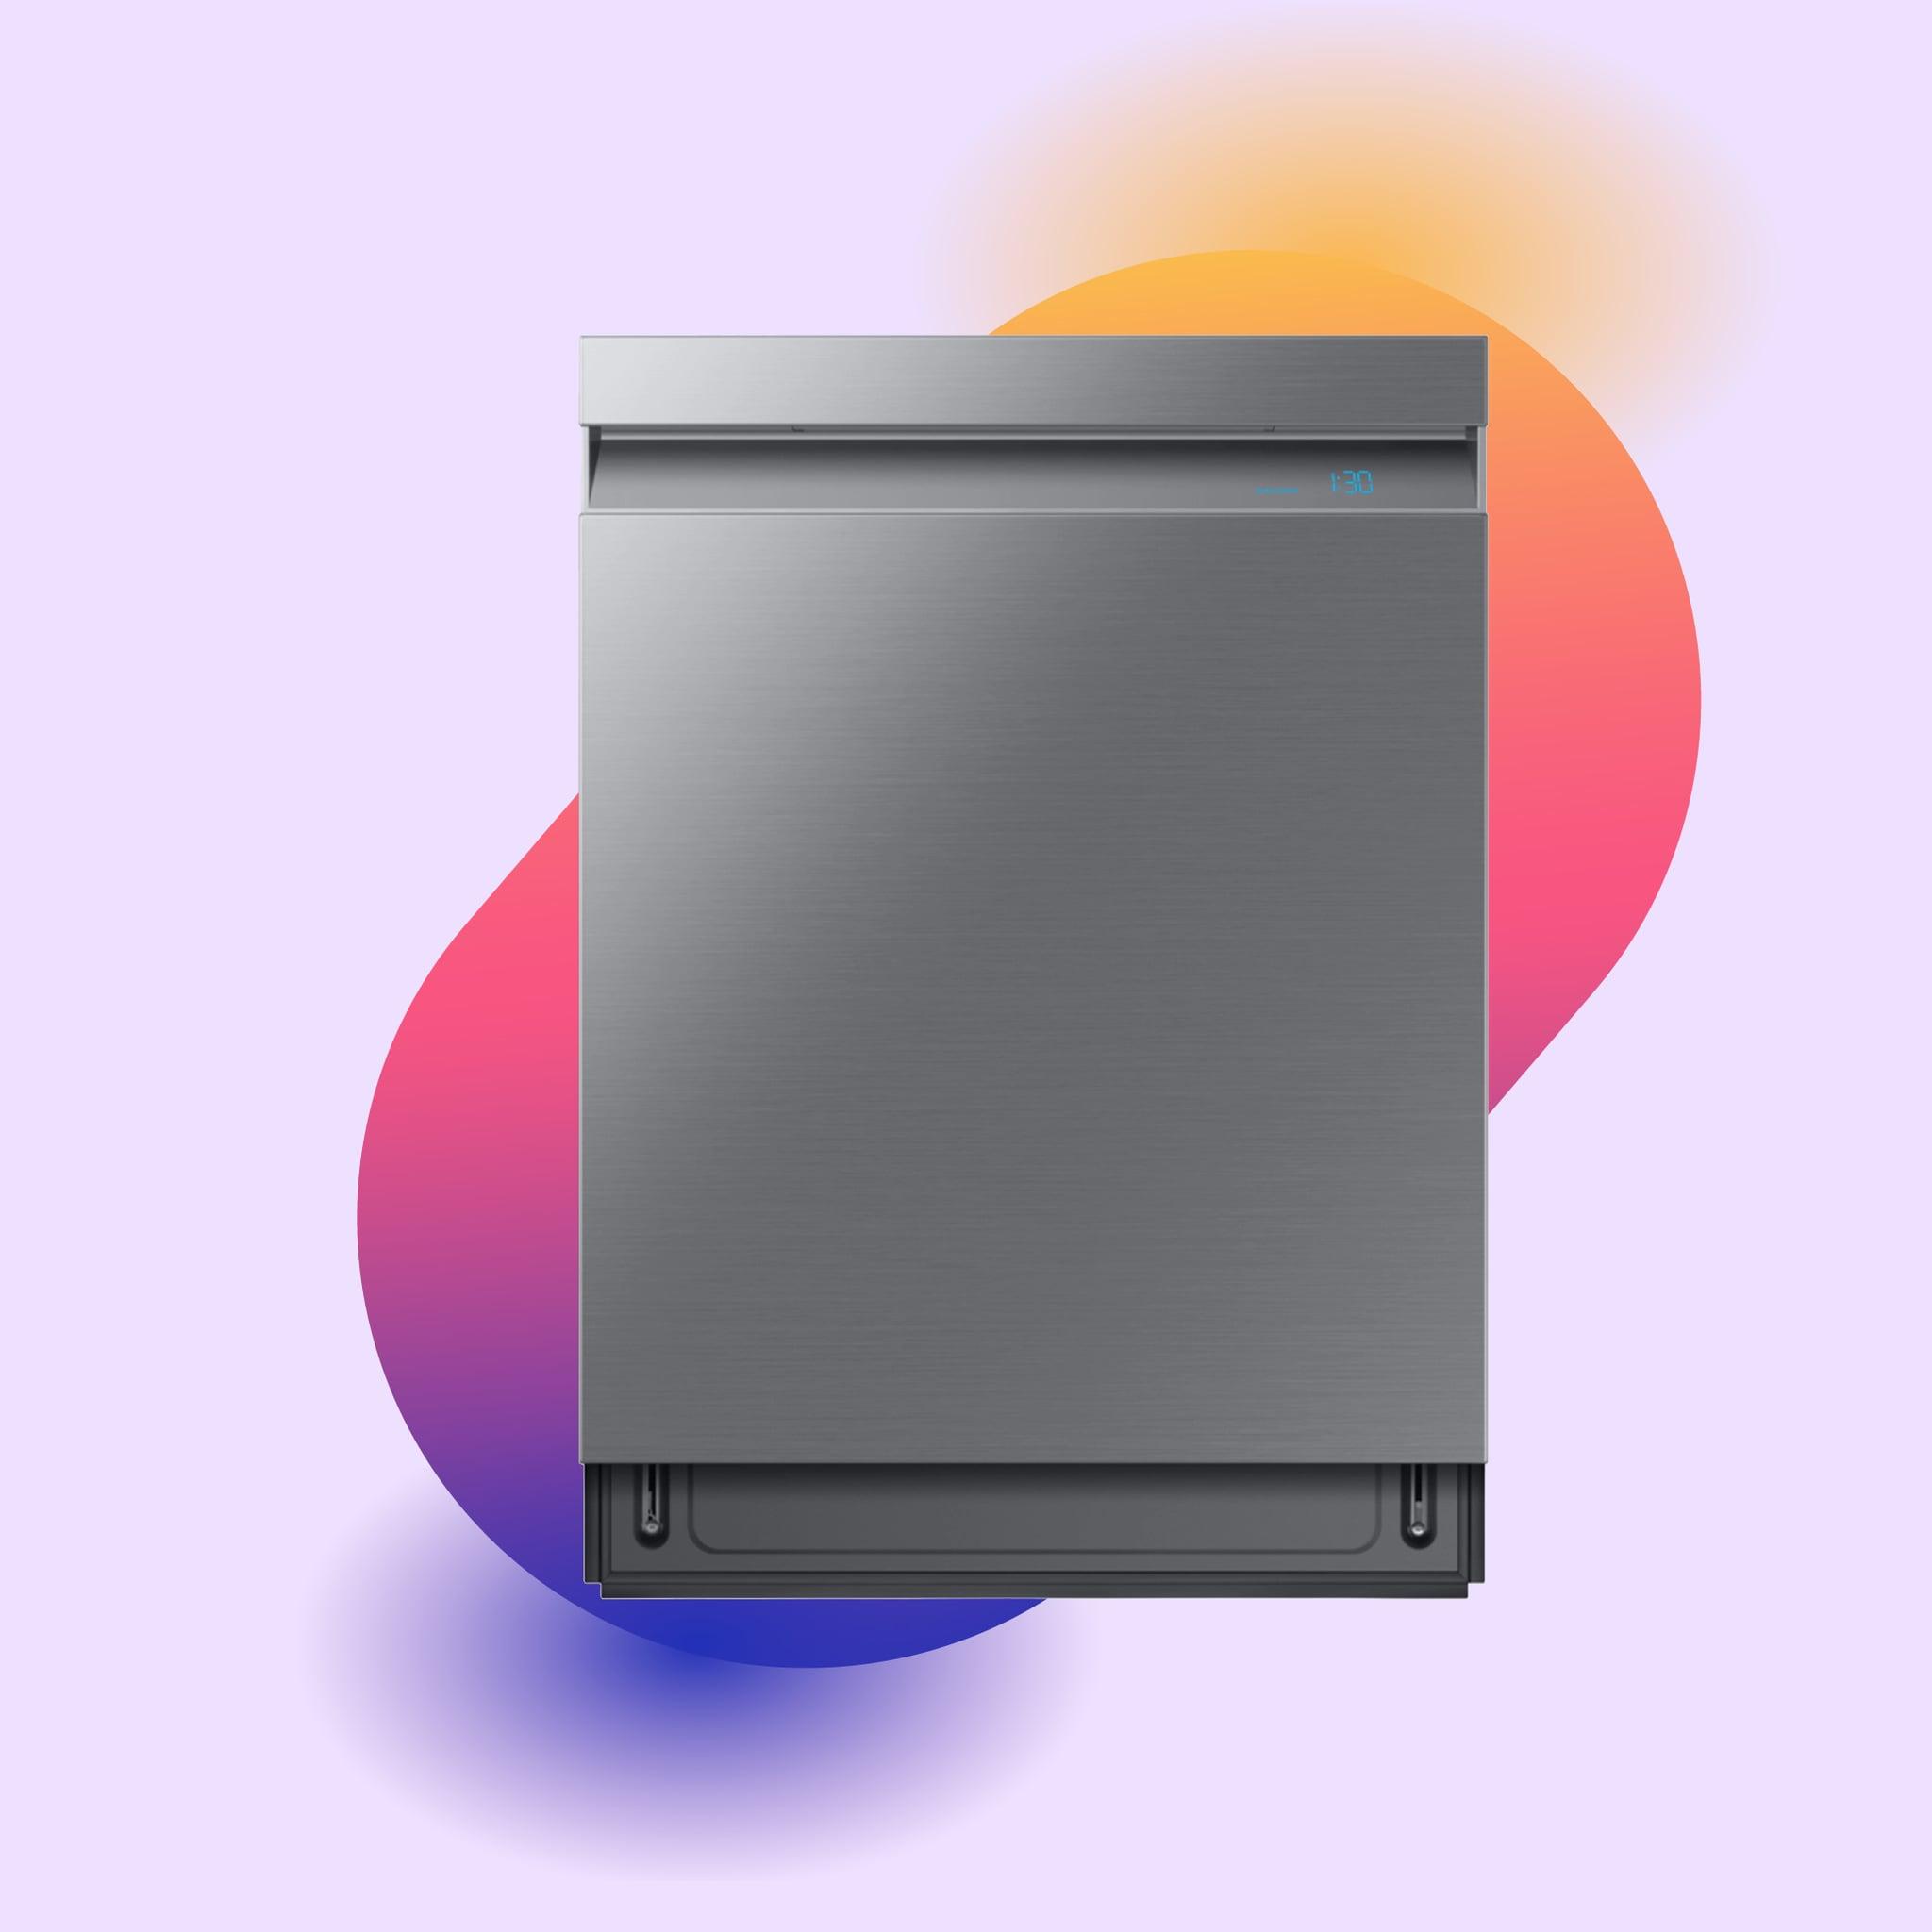 An Ultra-Efficient Dishwasher